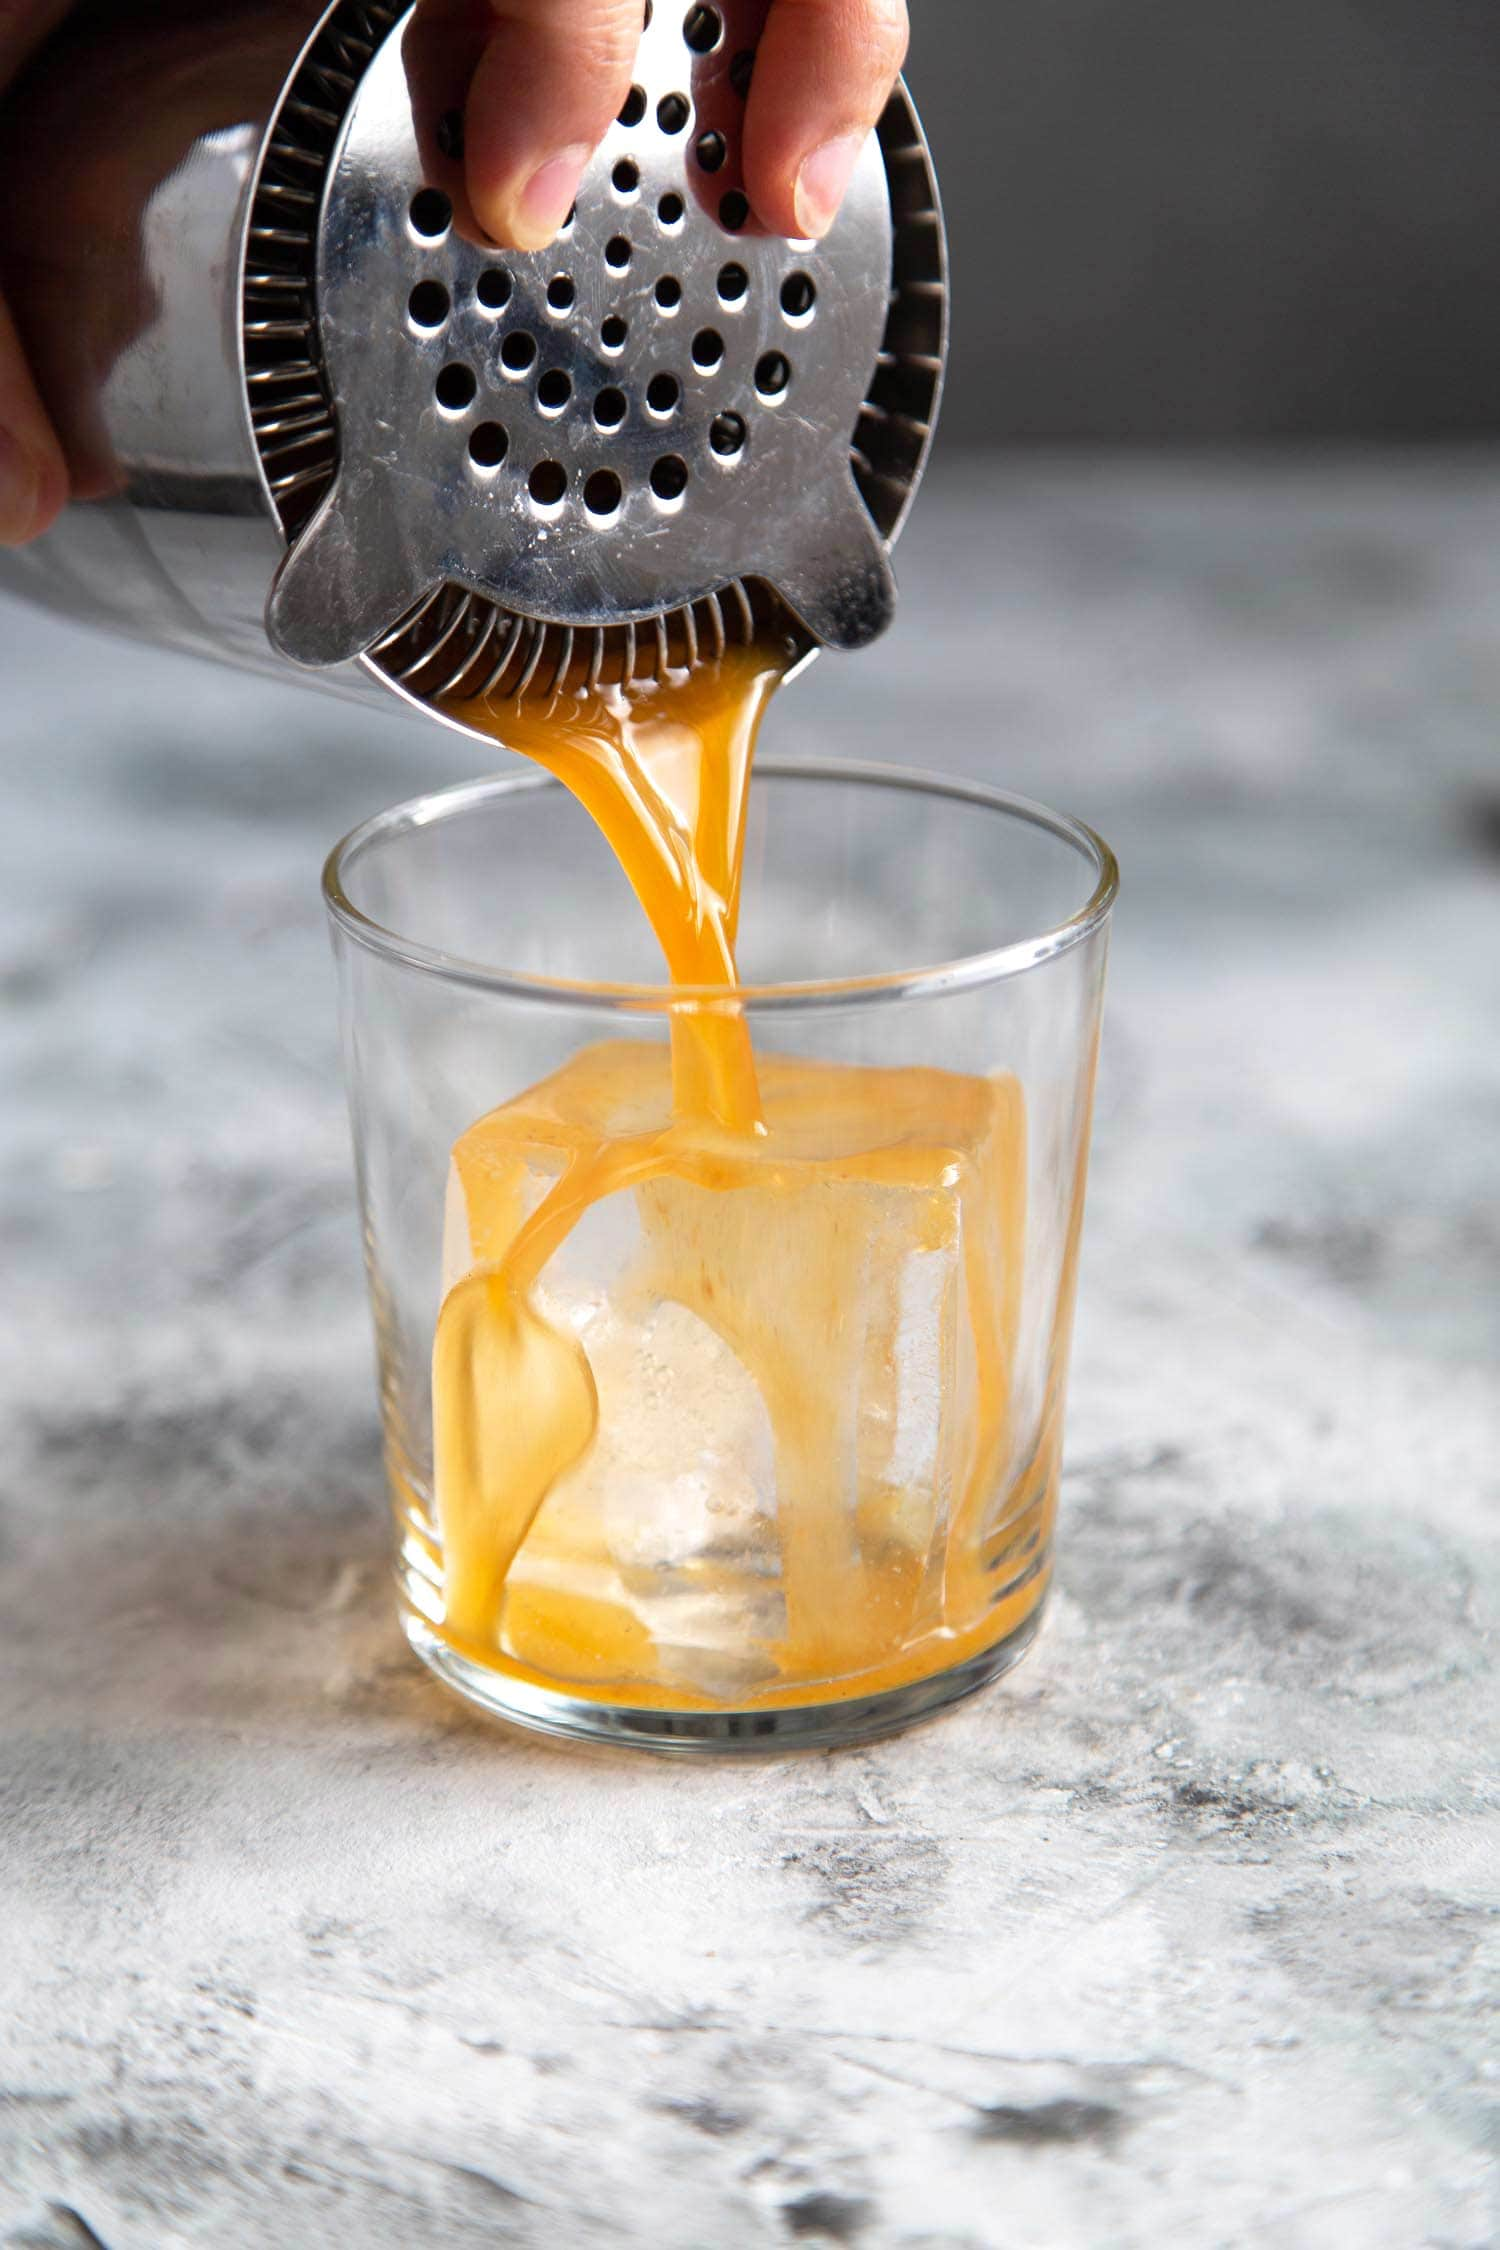 Mix autumn harvest cocktail (pumpkin bourbon cocktail) in a Boston shaker. Then, strain into serving glass.